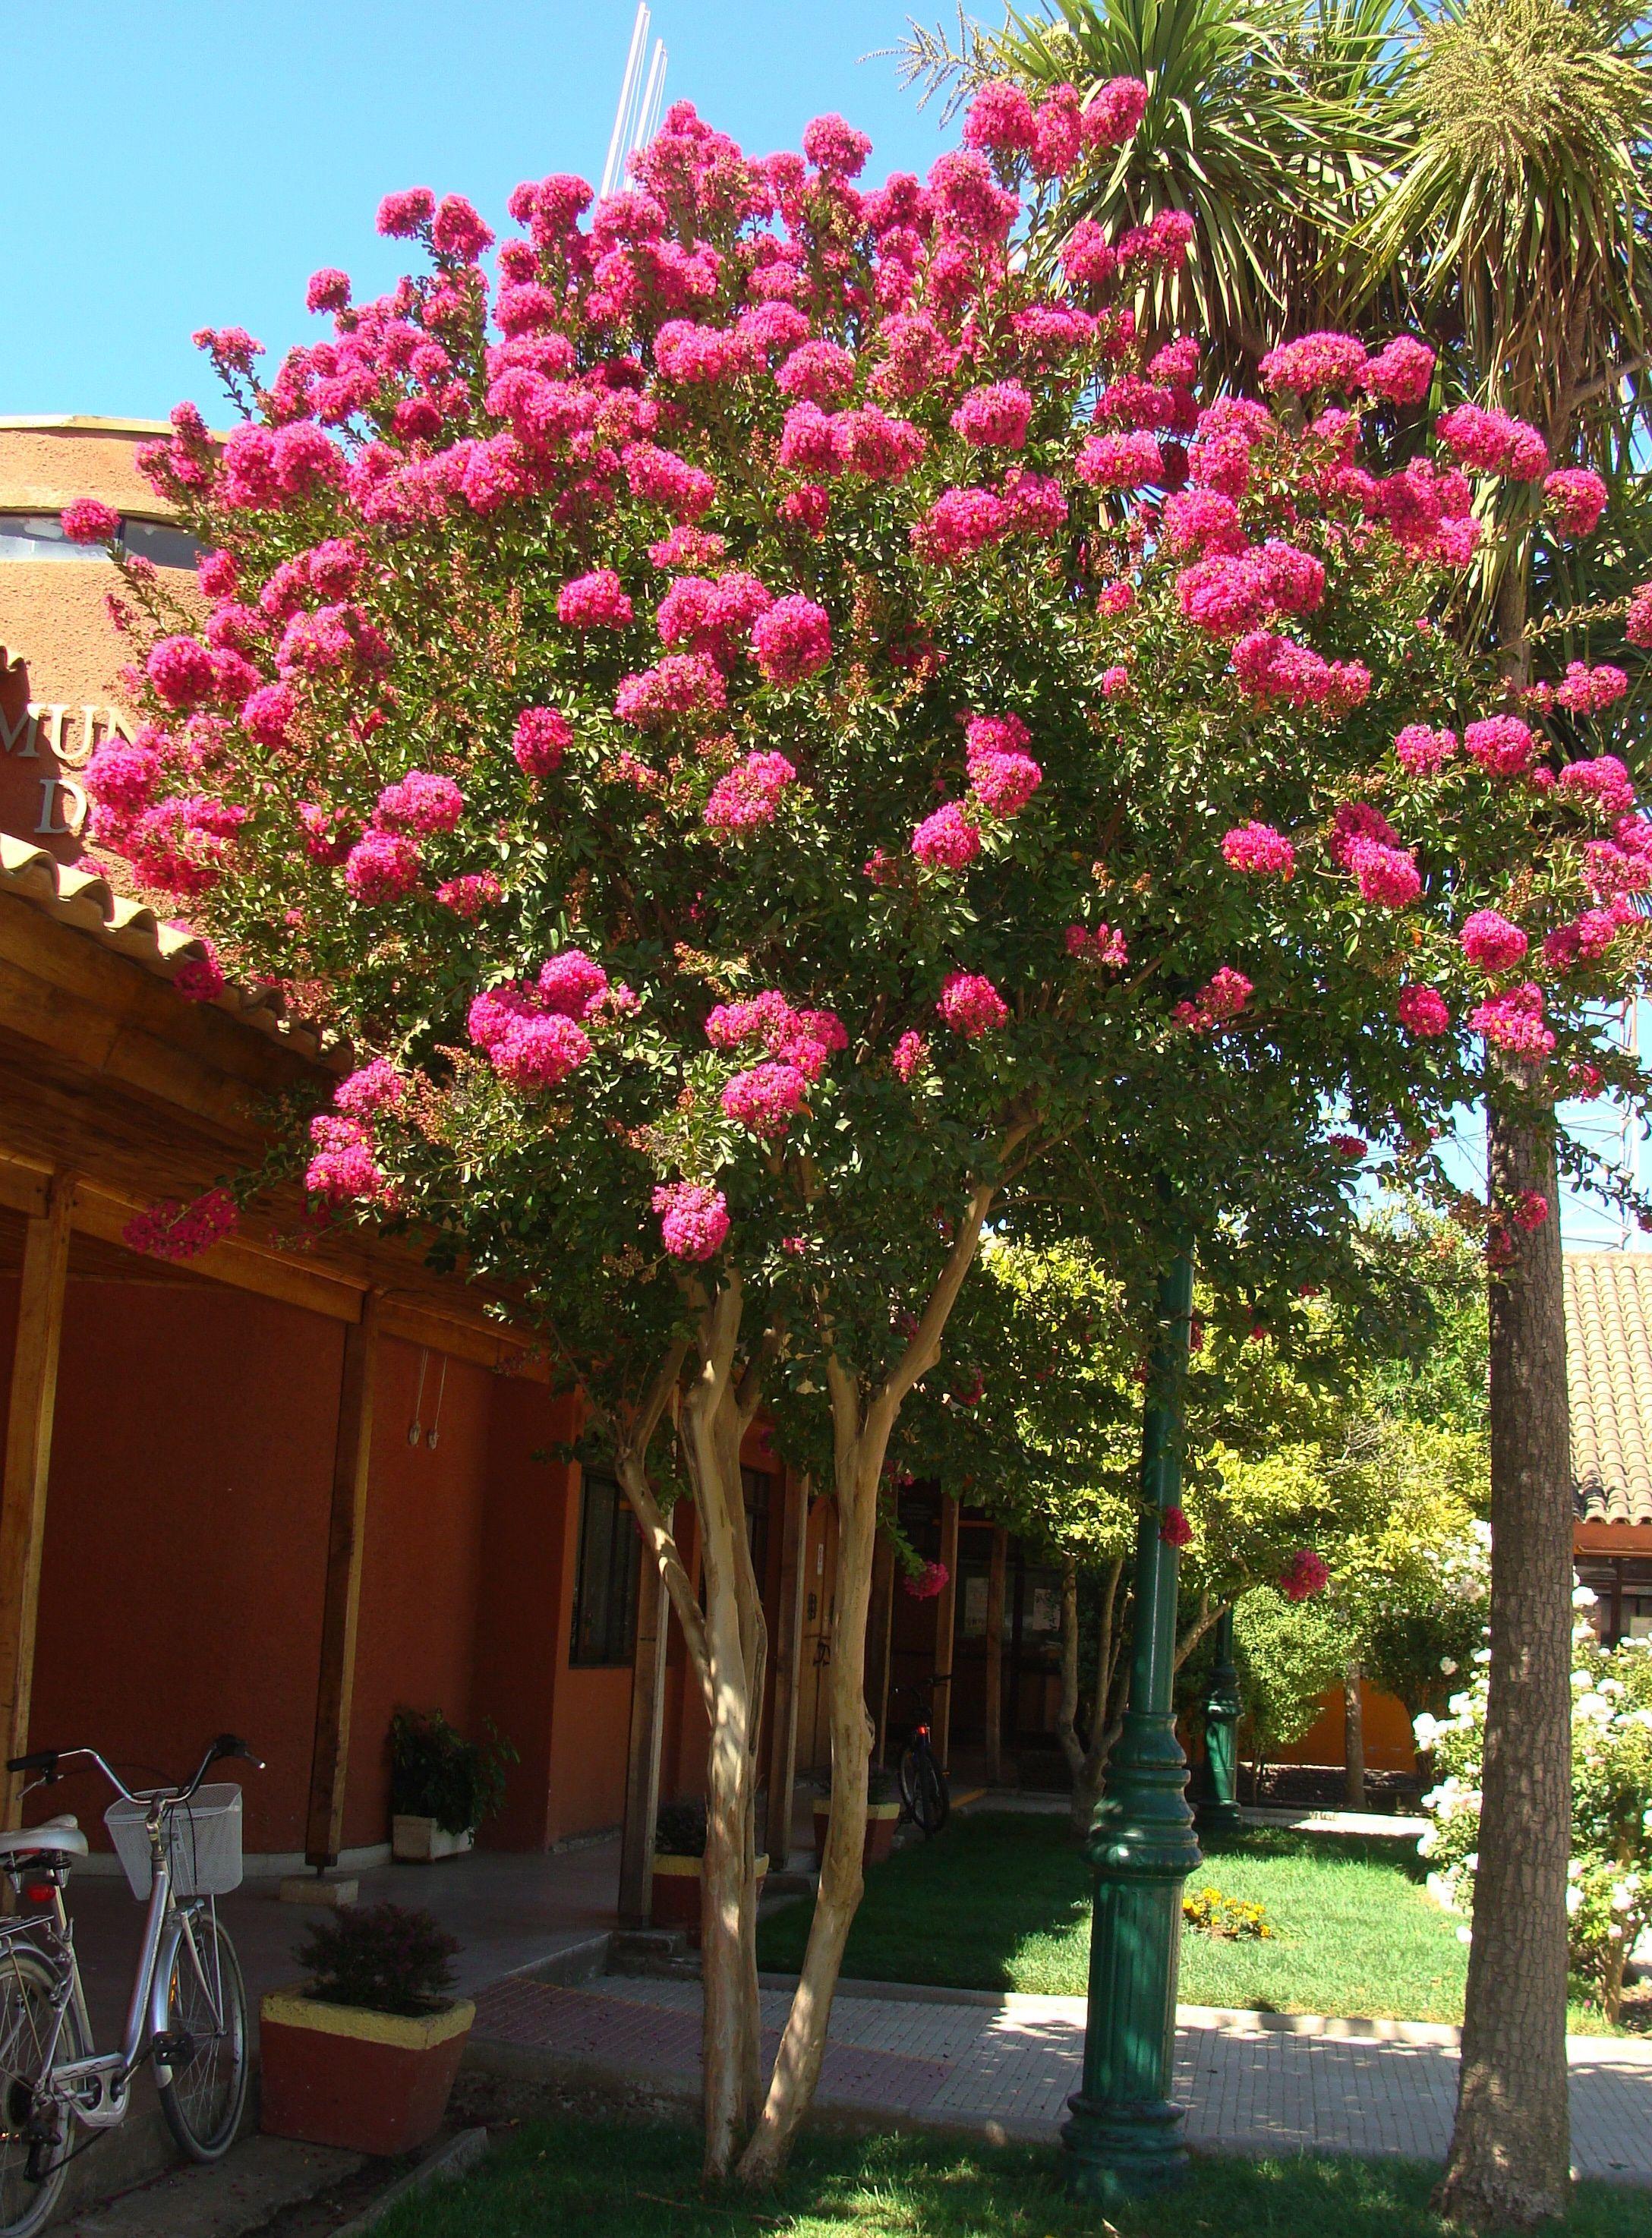 Crespon jardiner a pinterest cresp n arboles for Viveros arboles ornamentales